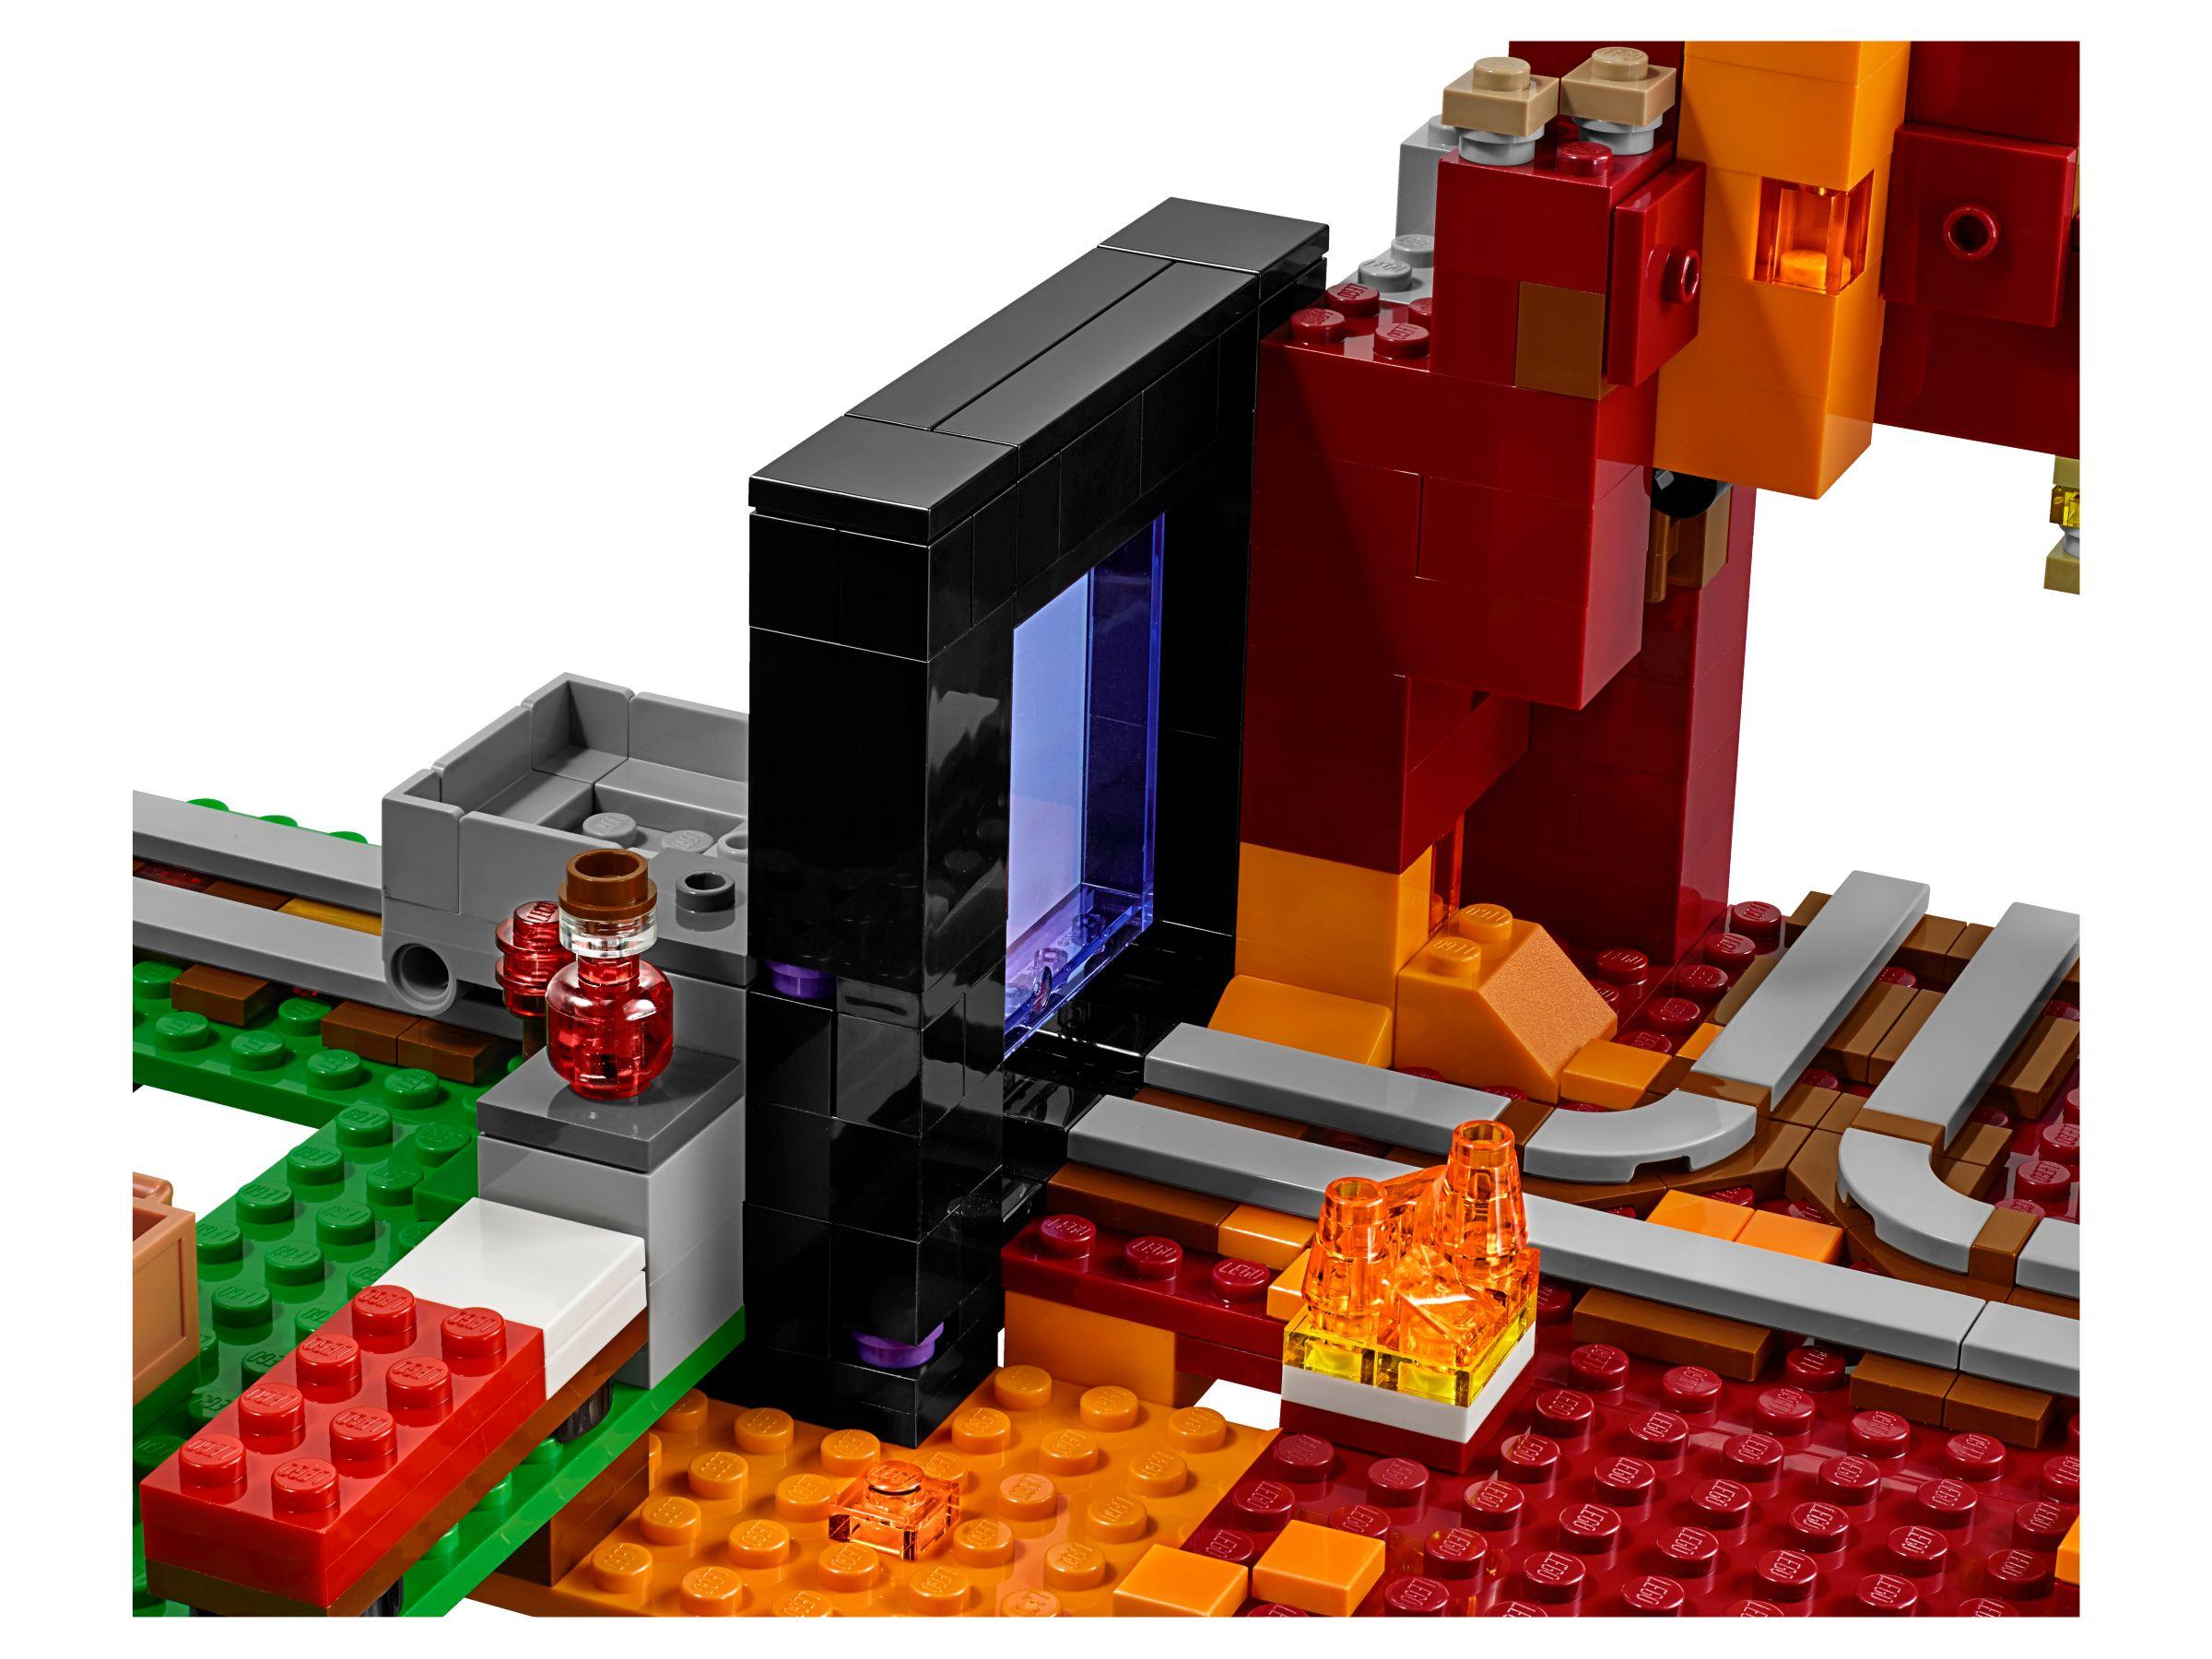 LEGO Minecraft 21143 Netherportal LEGO_21143_alt6.jpg. LEGO Minecraft 21143  Netherportal LEGO_21143_alt6.jpg